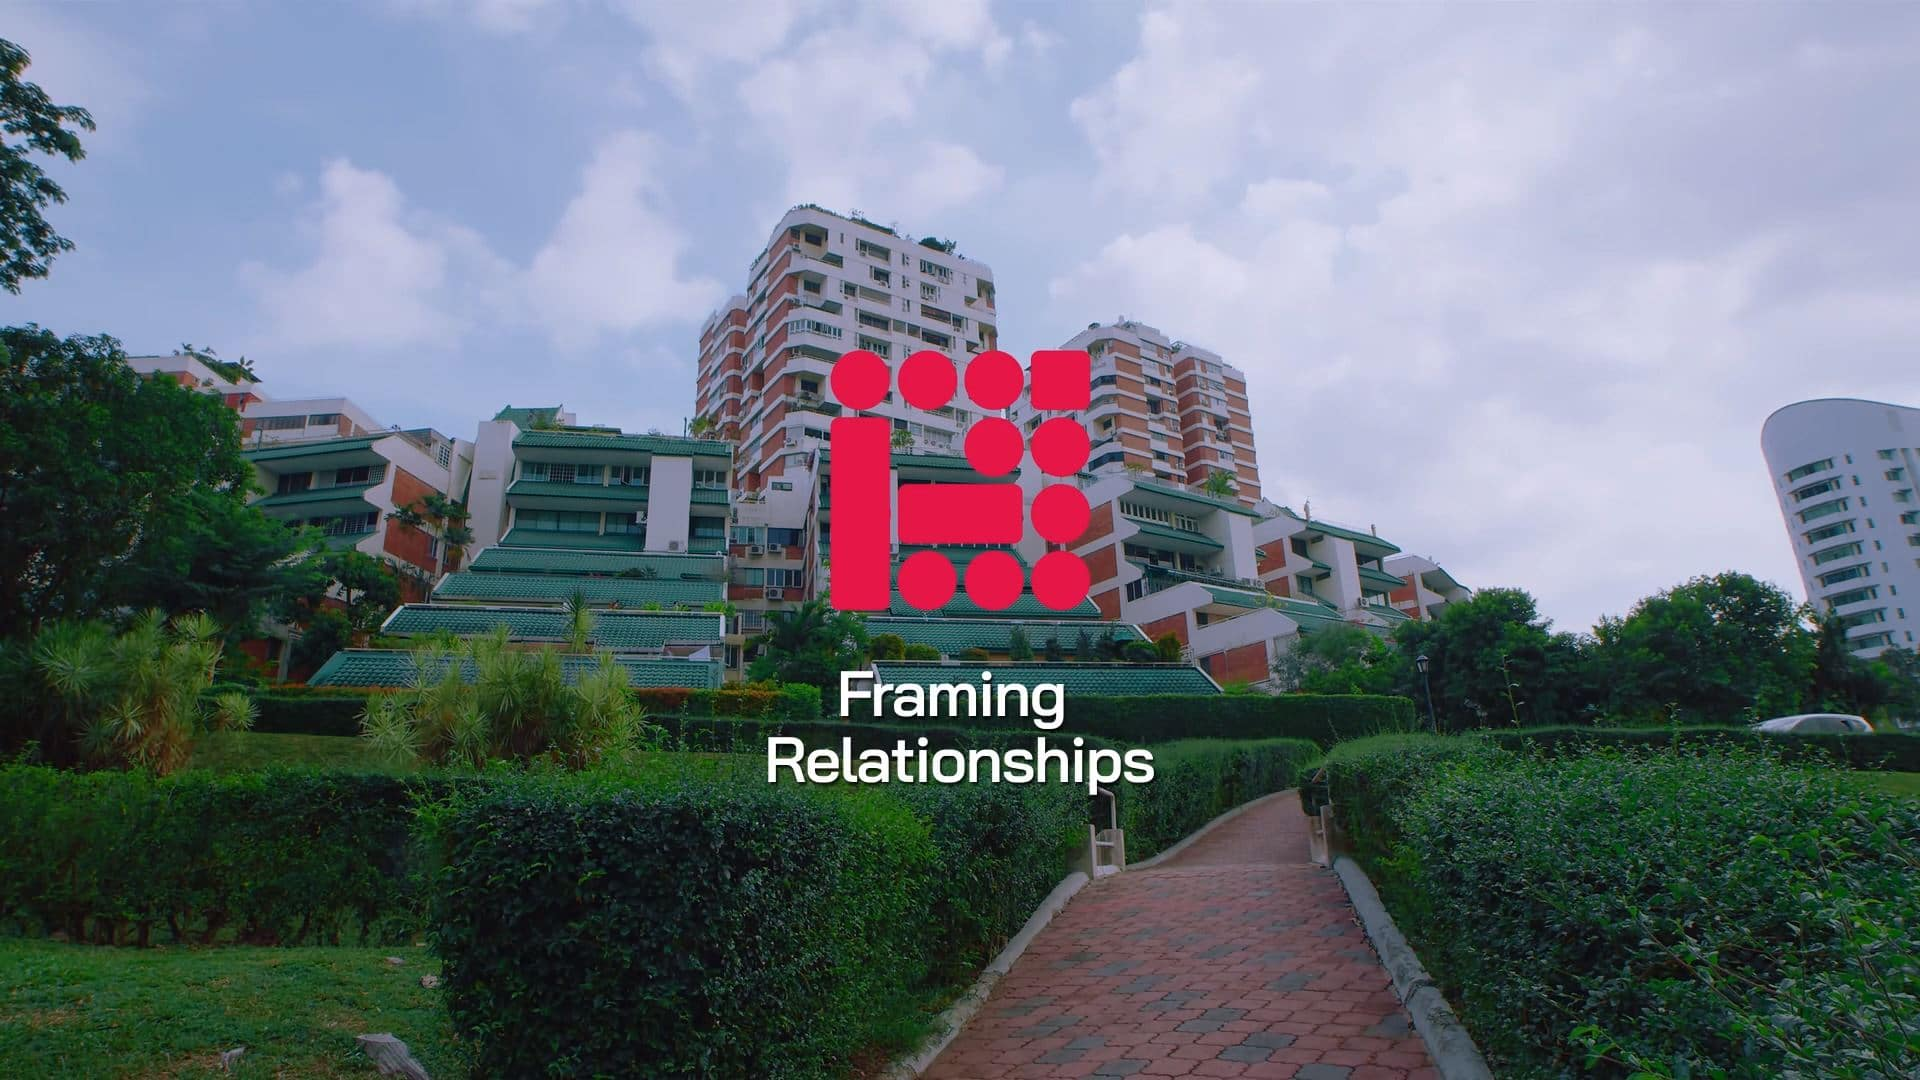 Framing Relationships